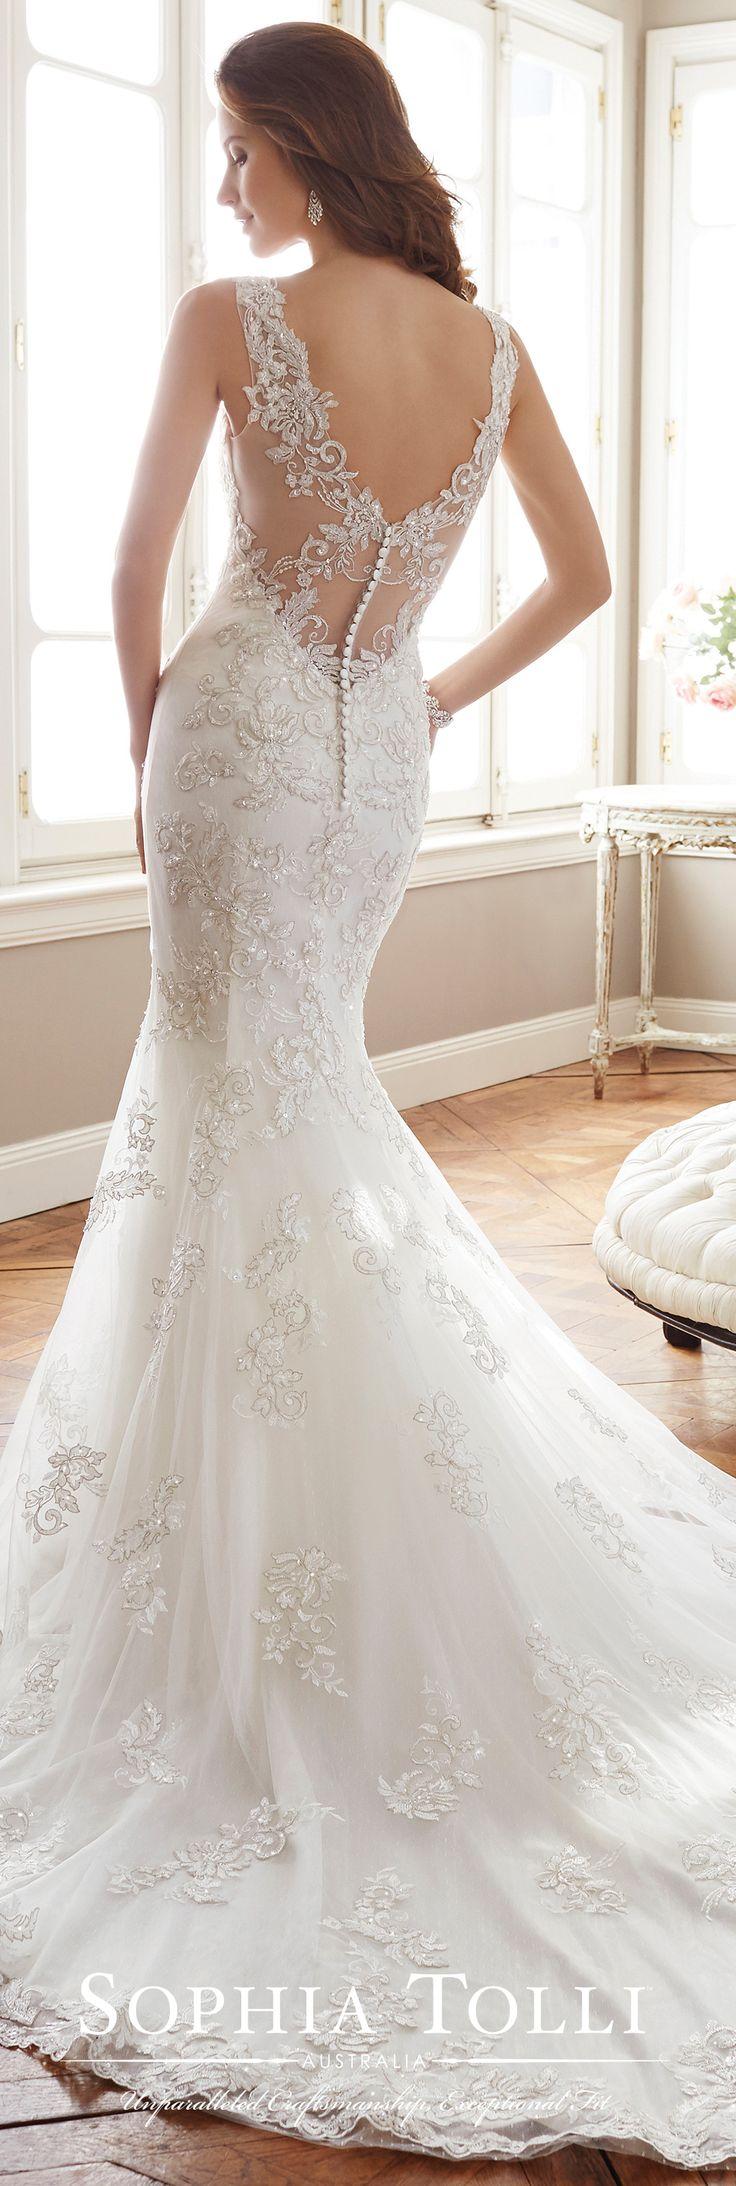 9321 best Wedding Wardrobe: G I R L S images on Pinterest ...